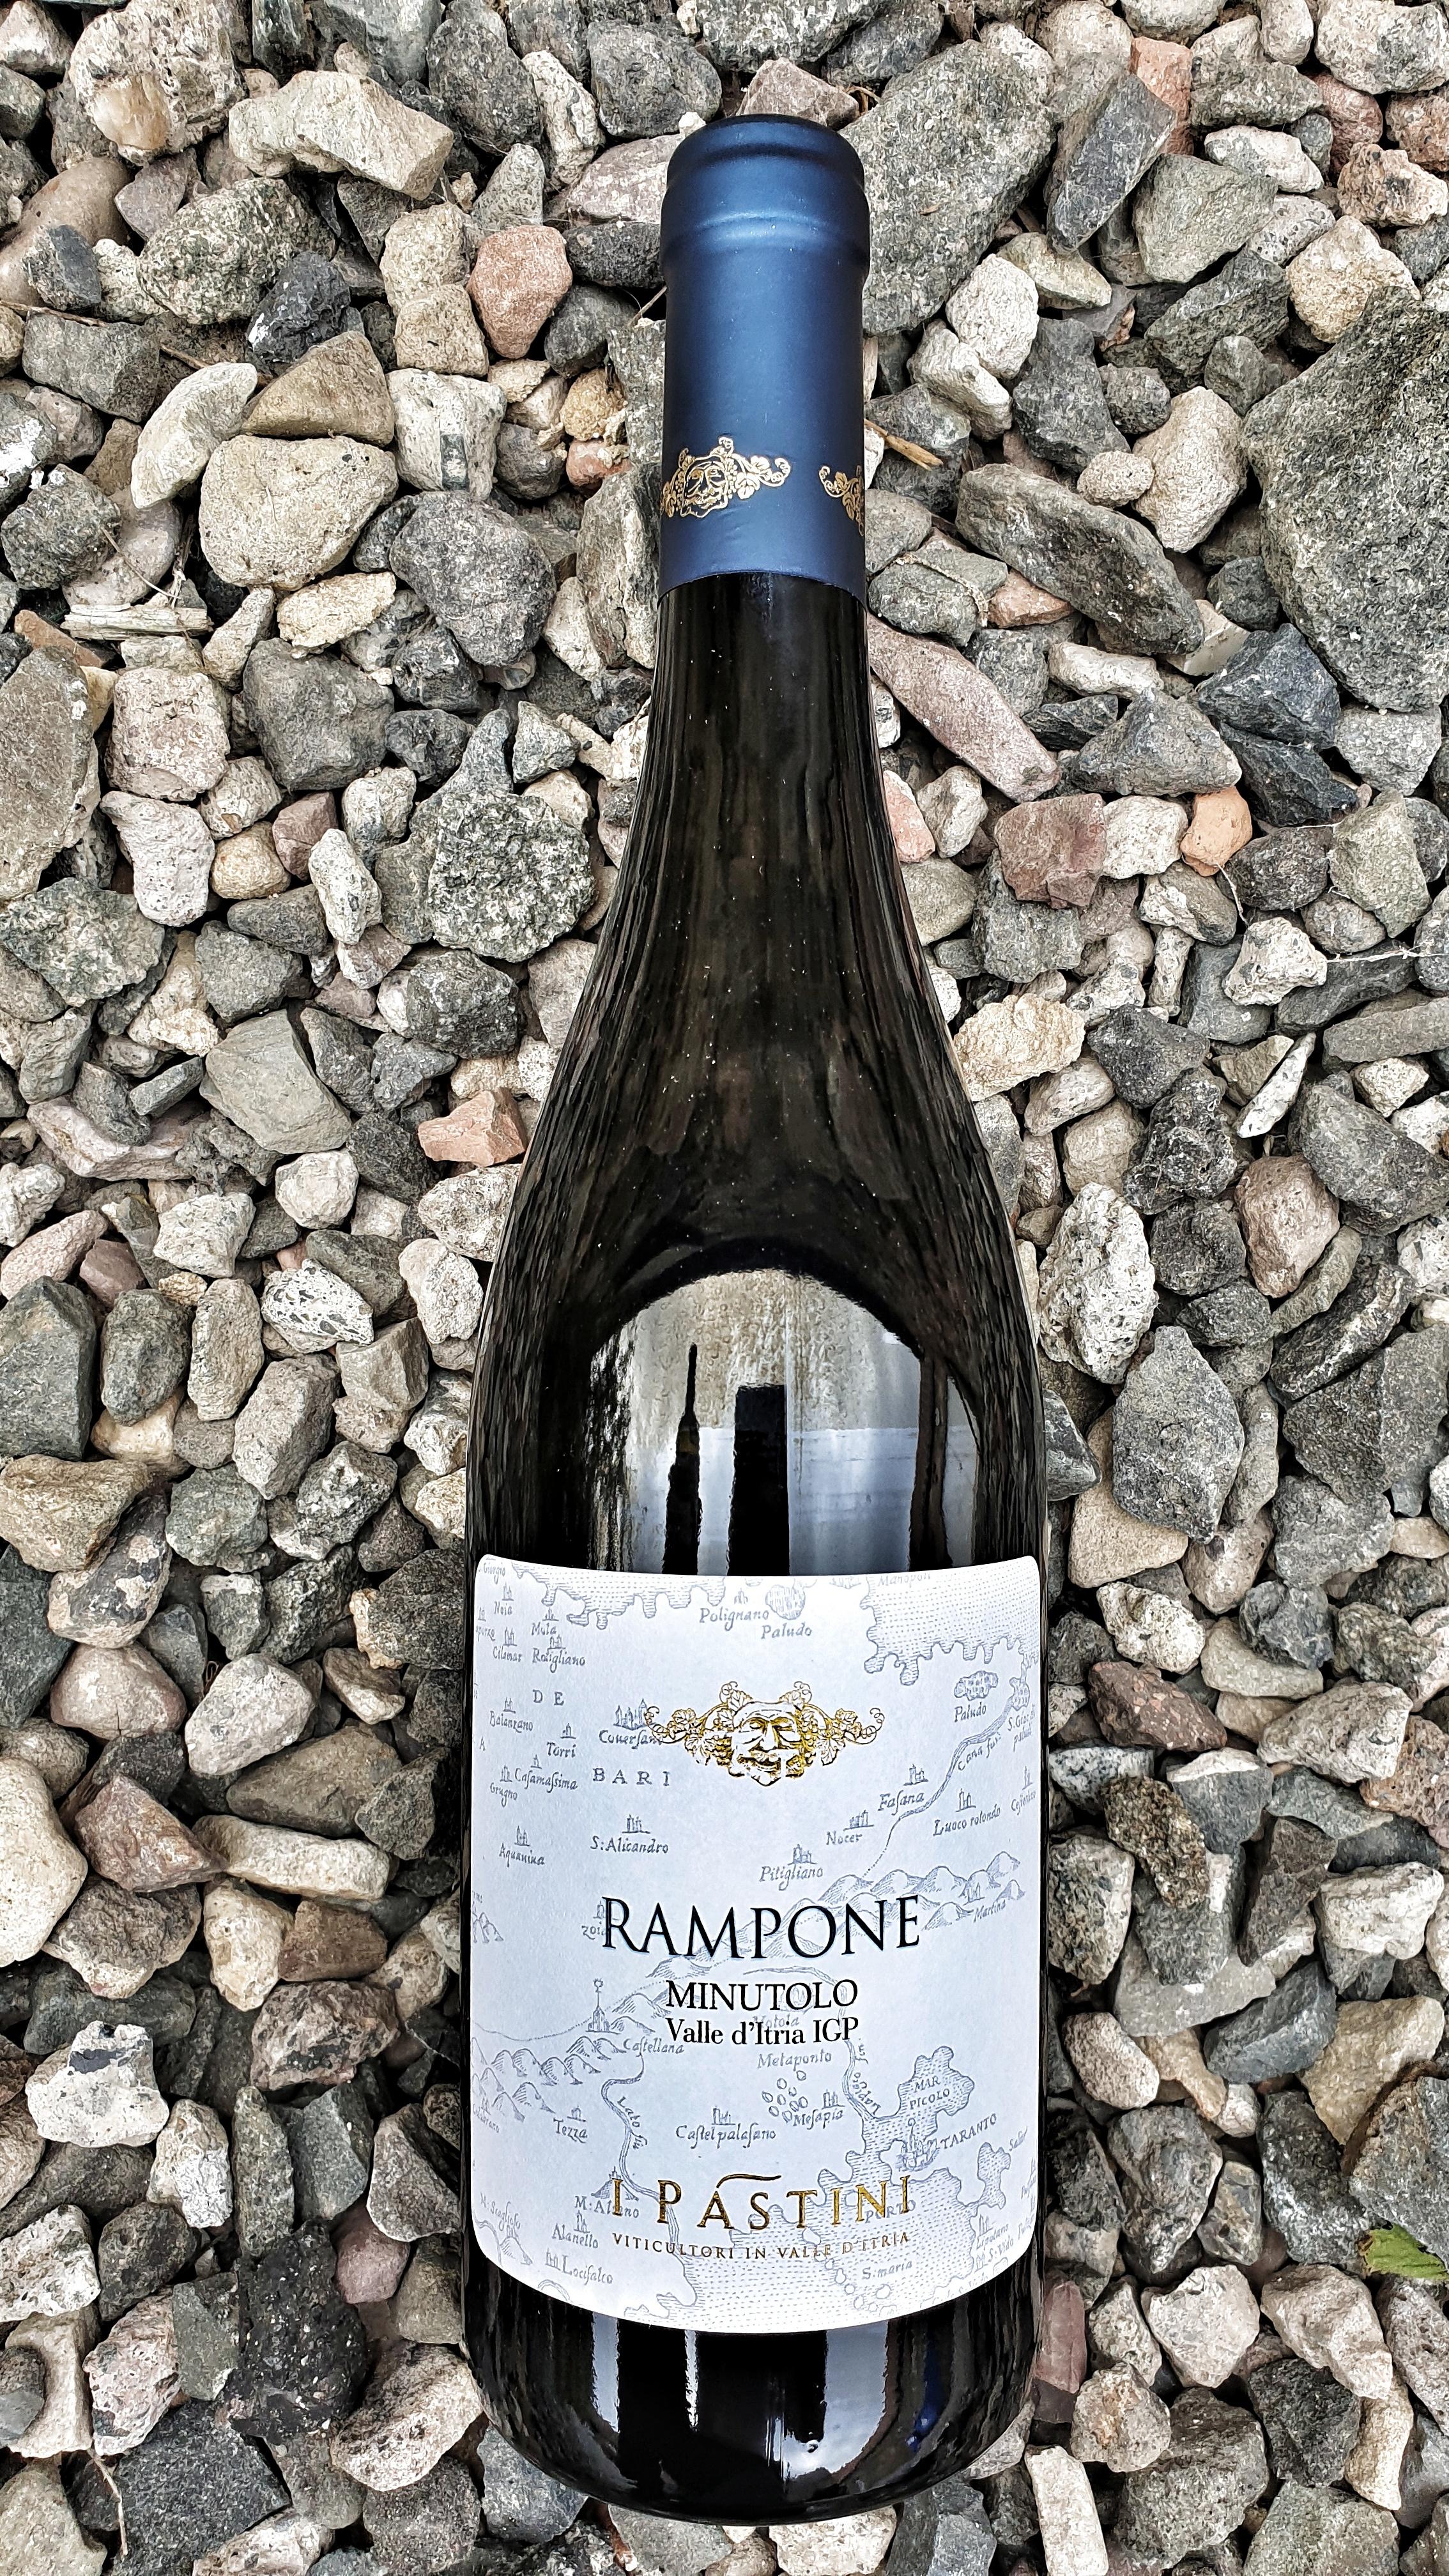 Minutolo 'Rampone' I Pastini 2017 00190